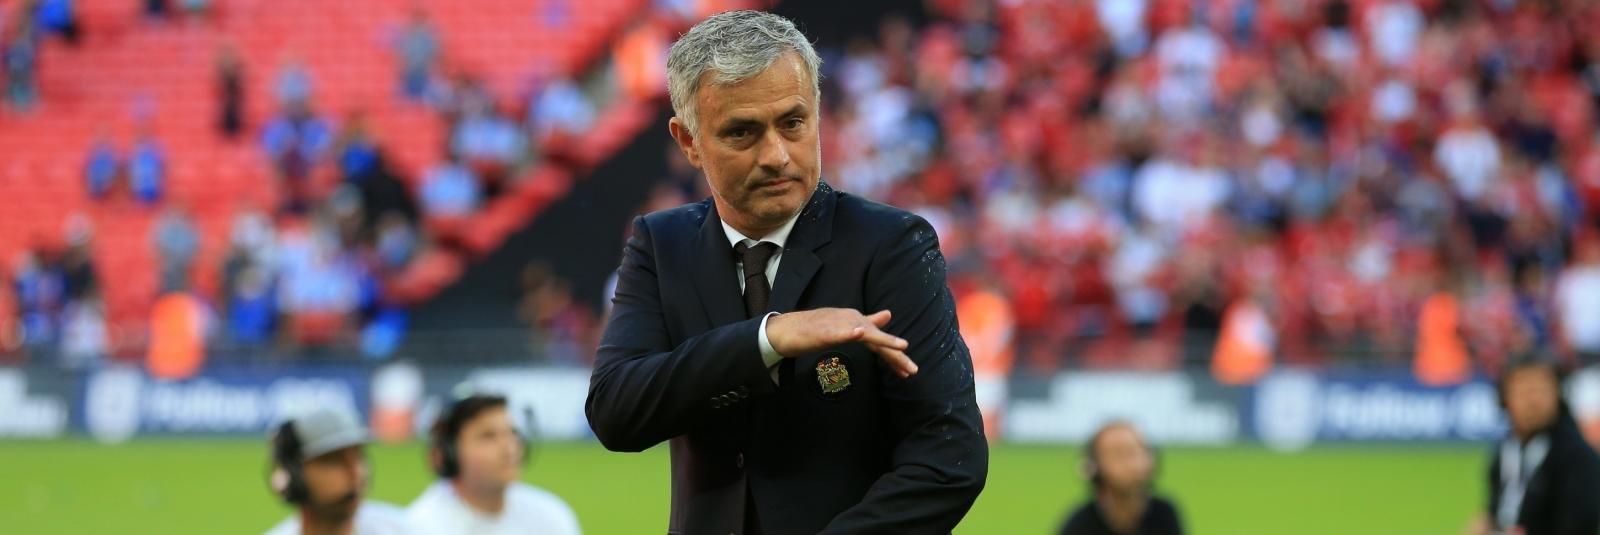 Manchester United vs Zorya Luhansk: Europa League Preview ...